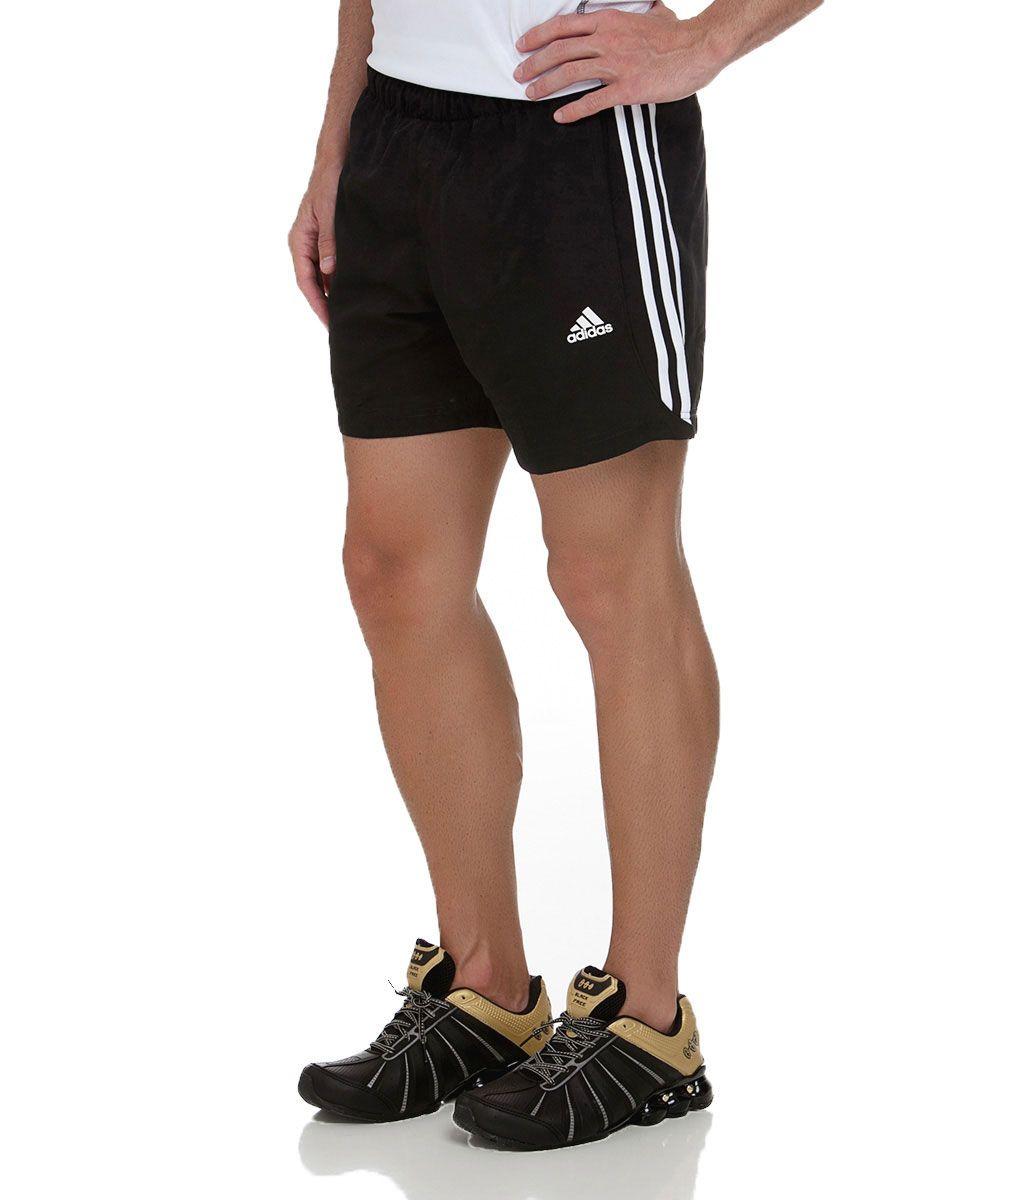 dfdc67ced9146 Short Esportivo Masculino Adidas Chelsea - Lojas Renner